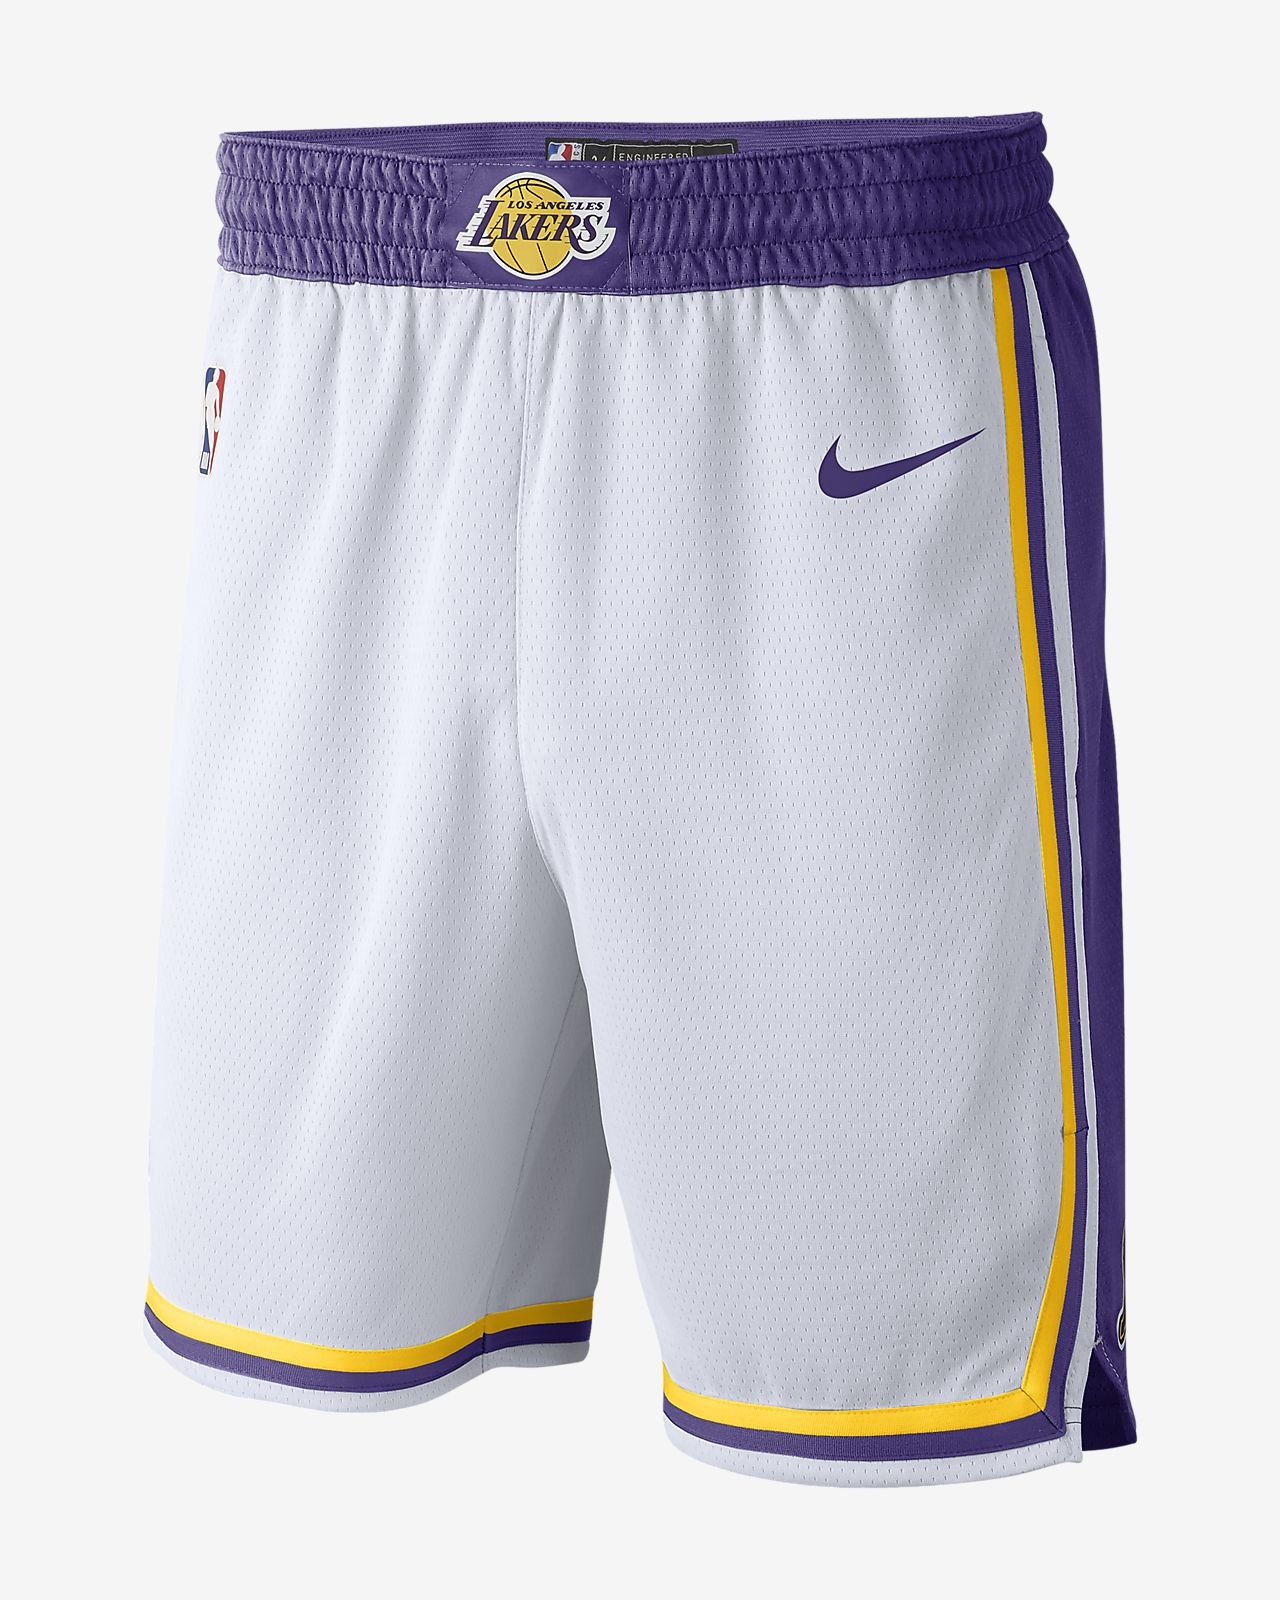 洛杉矶湖人队 Association Edition Swingman Nike 男子 NBA 短裤